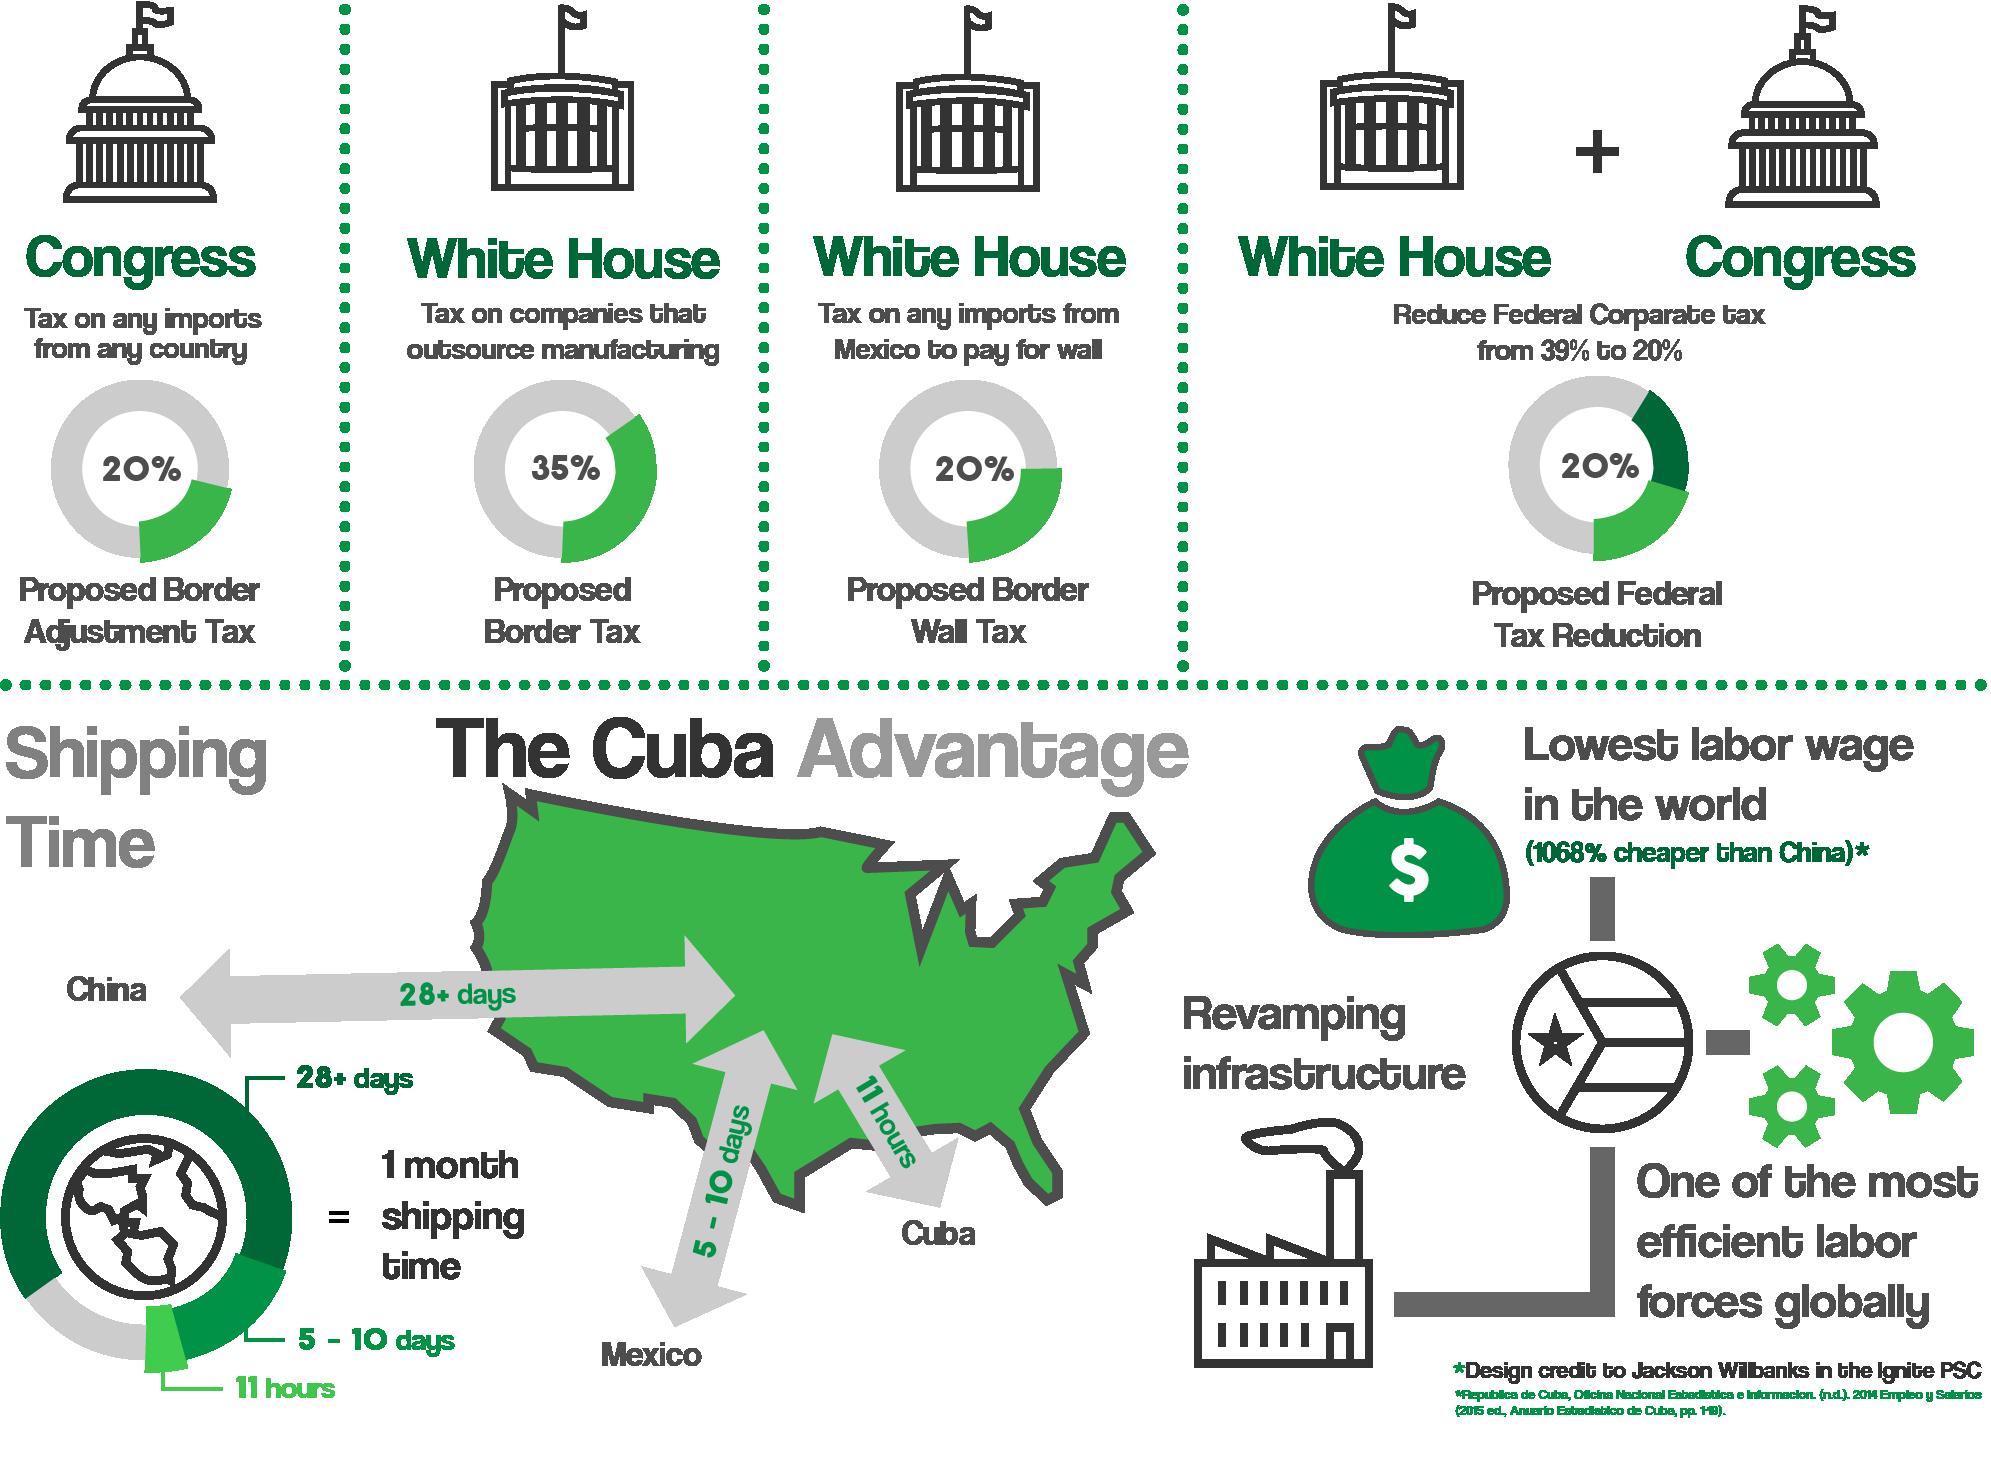 The Cuba Advantage Infographic